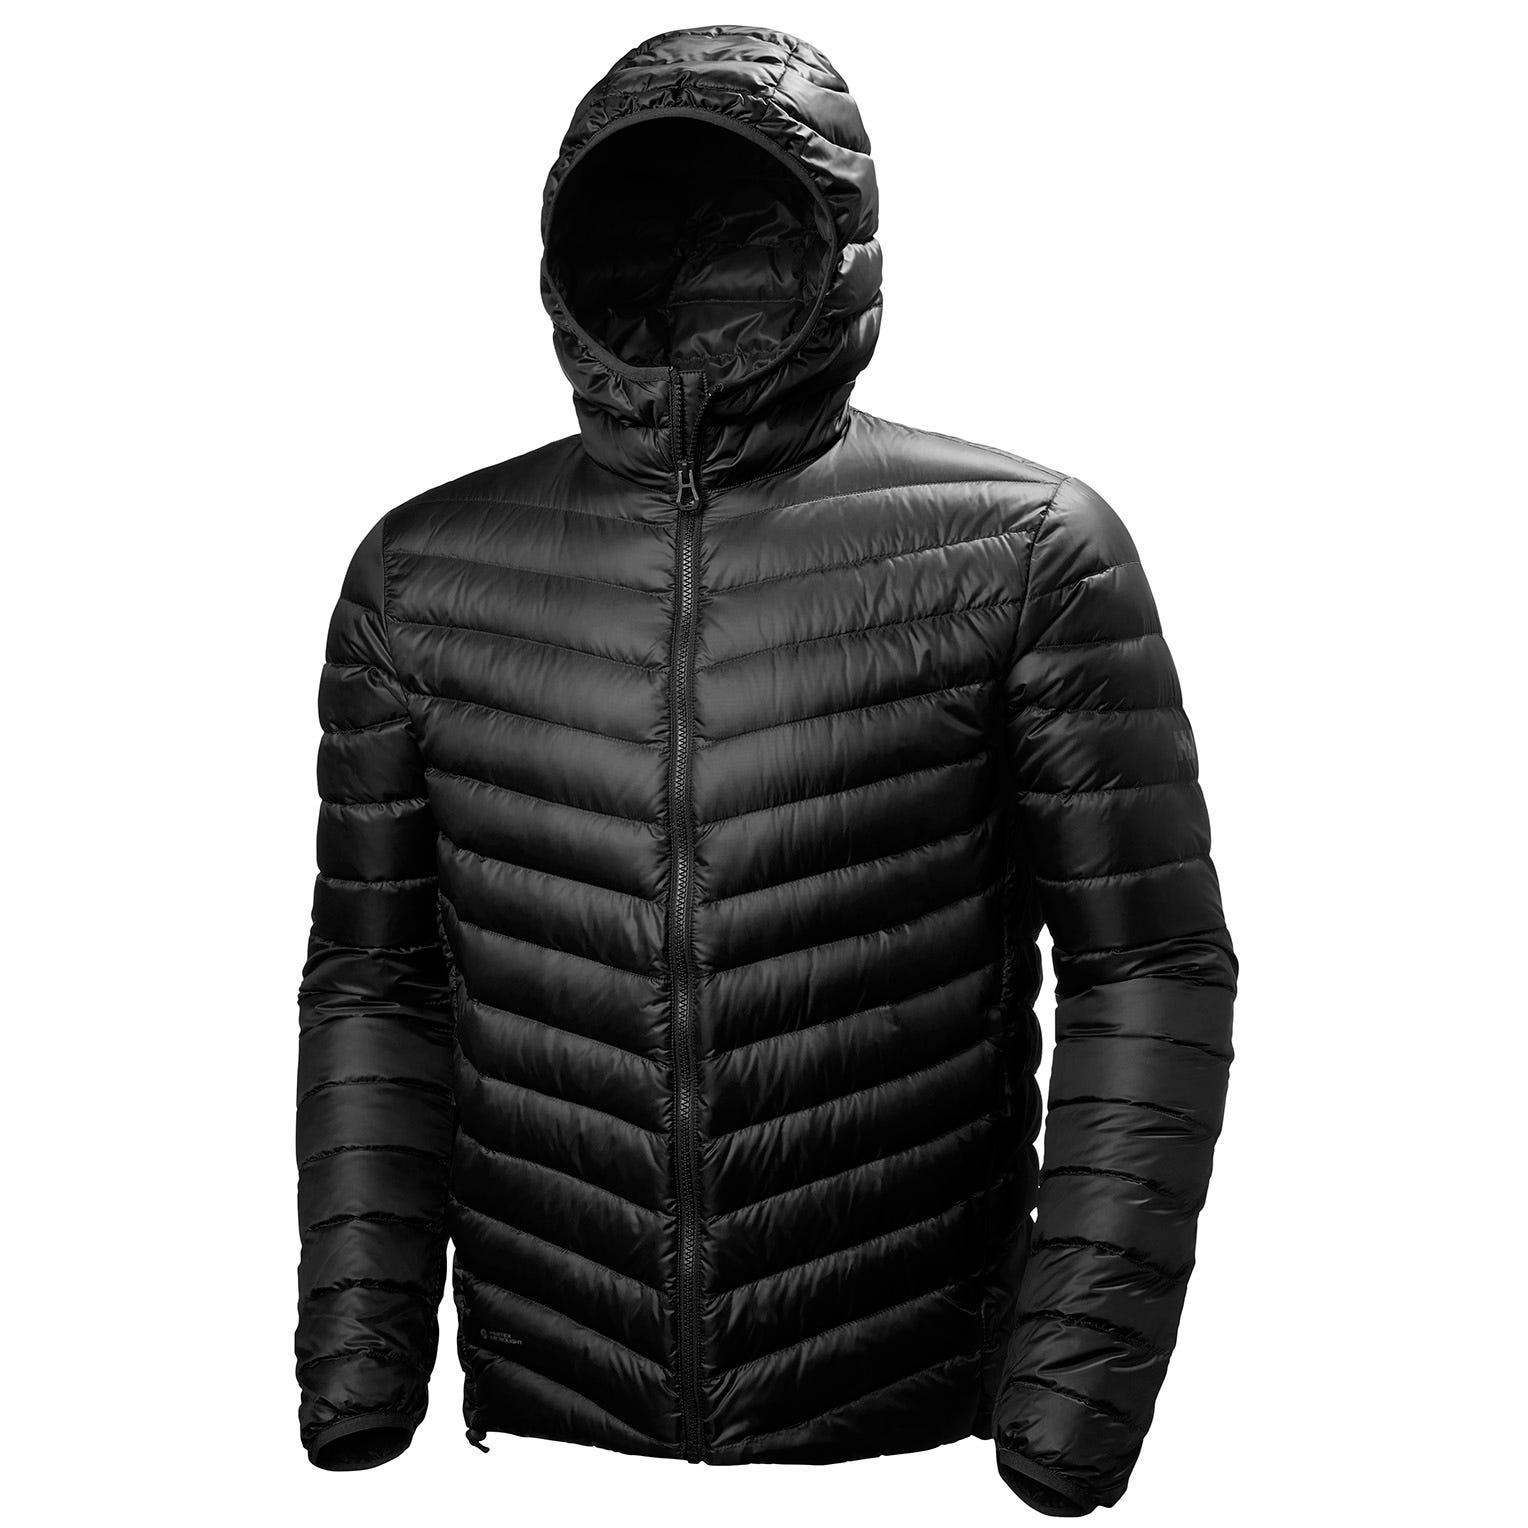 Helly Hansen Verglas Hooded Down Insulator Mens Hiking Jacket Black XXL